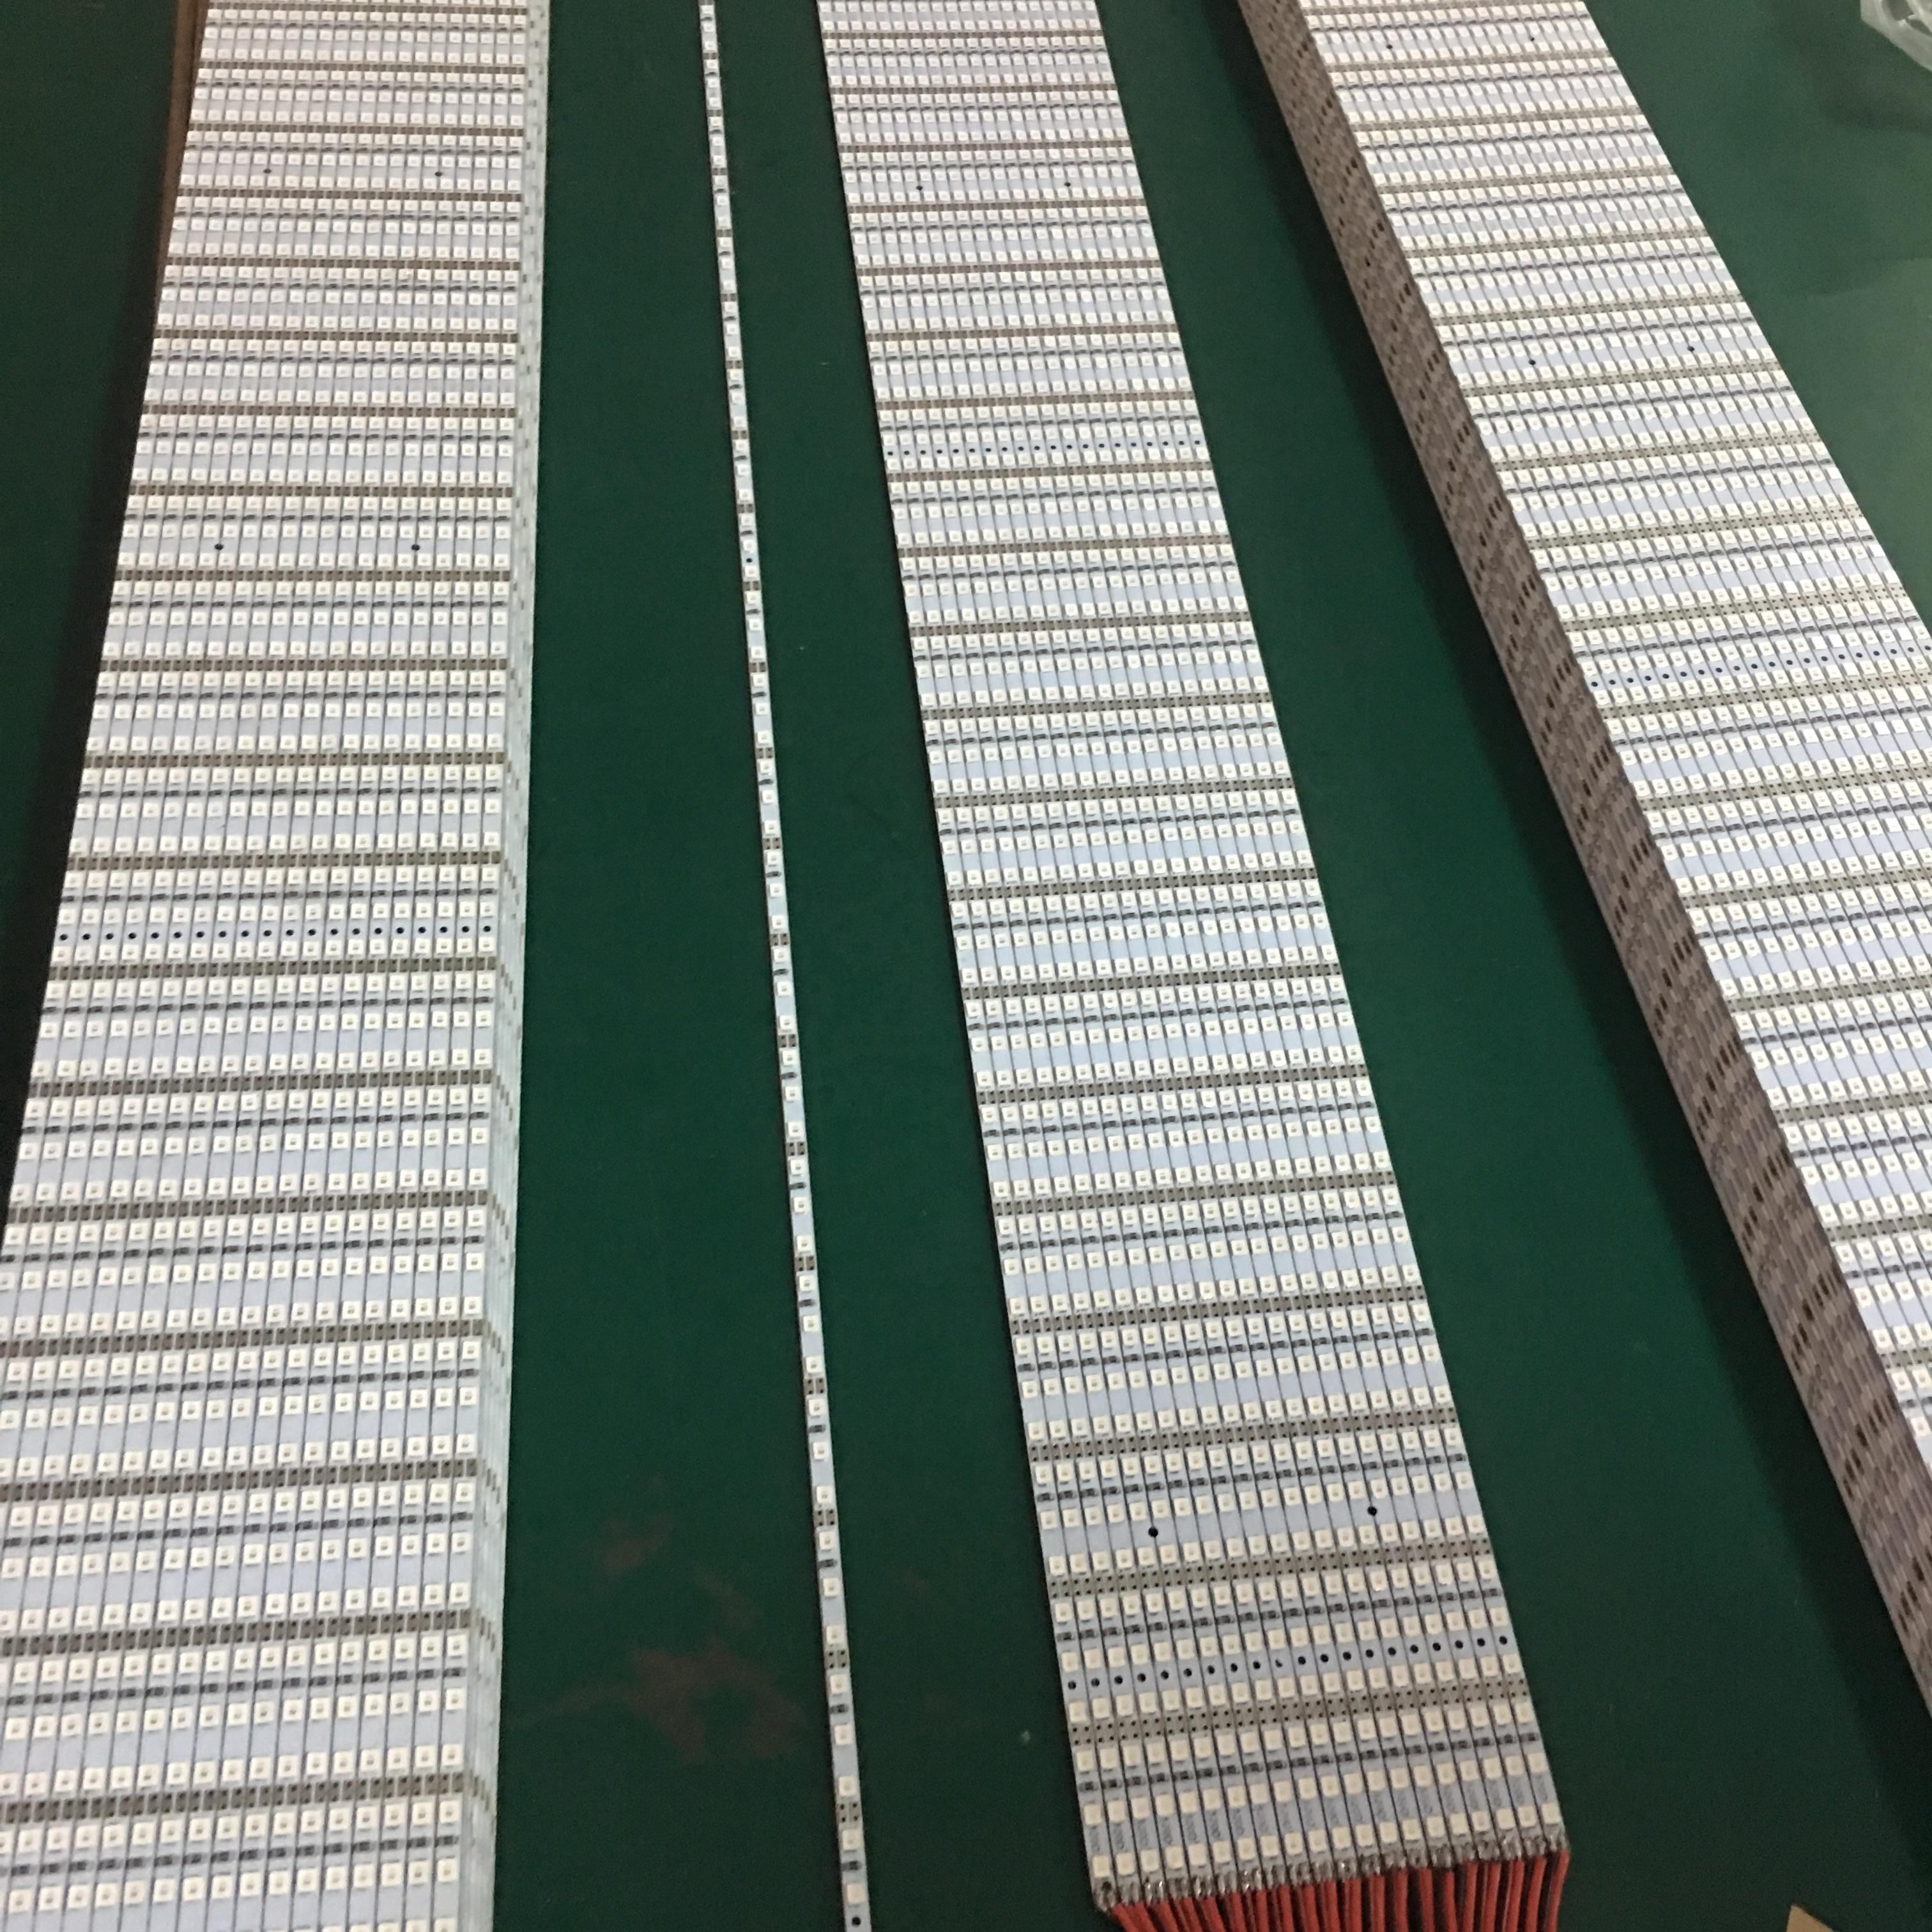 12V smd 2835 led strip light 4mm 120leds customized width high brightness ip20 non-waterproof led bar lighting